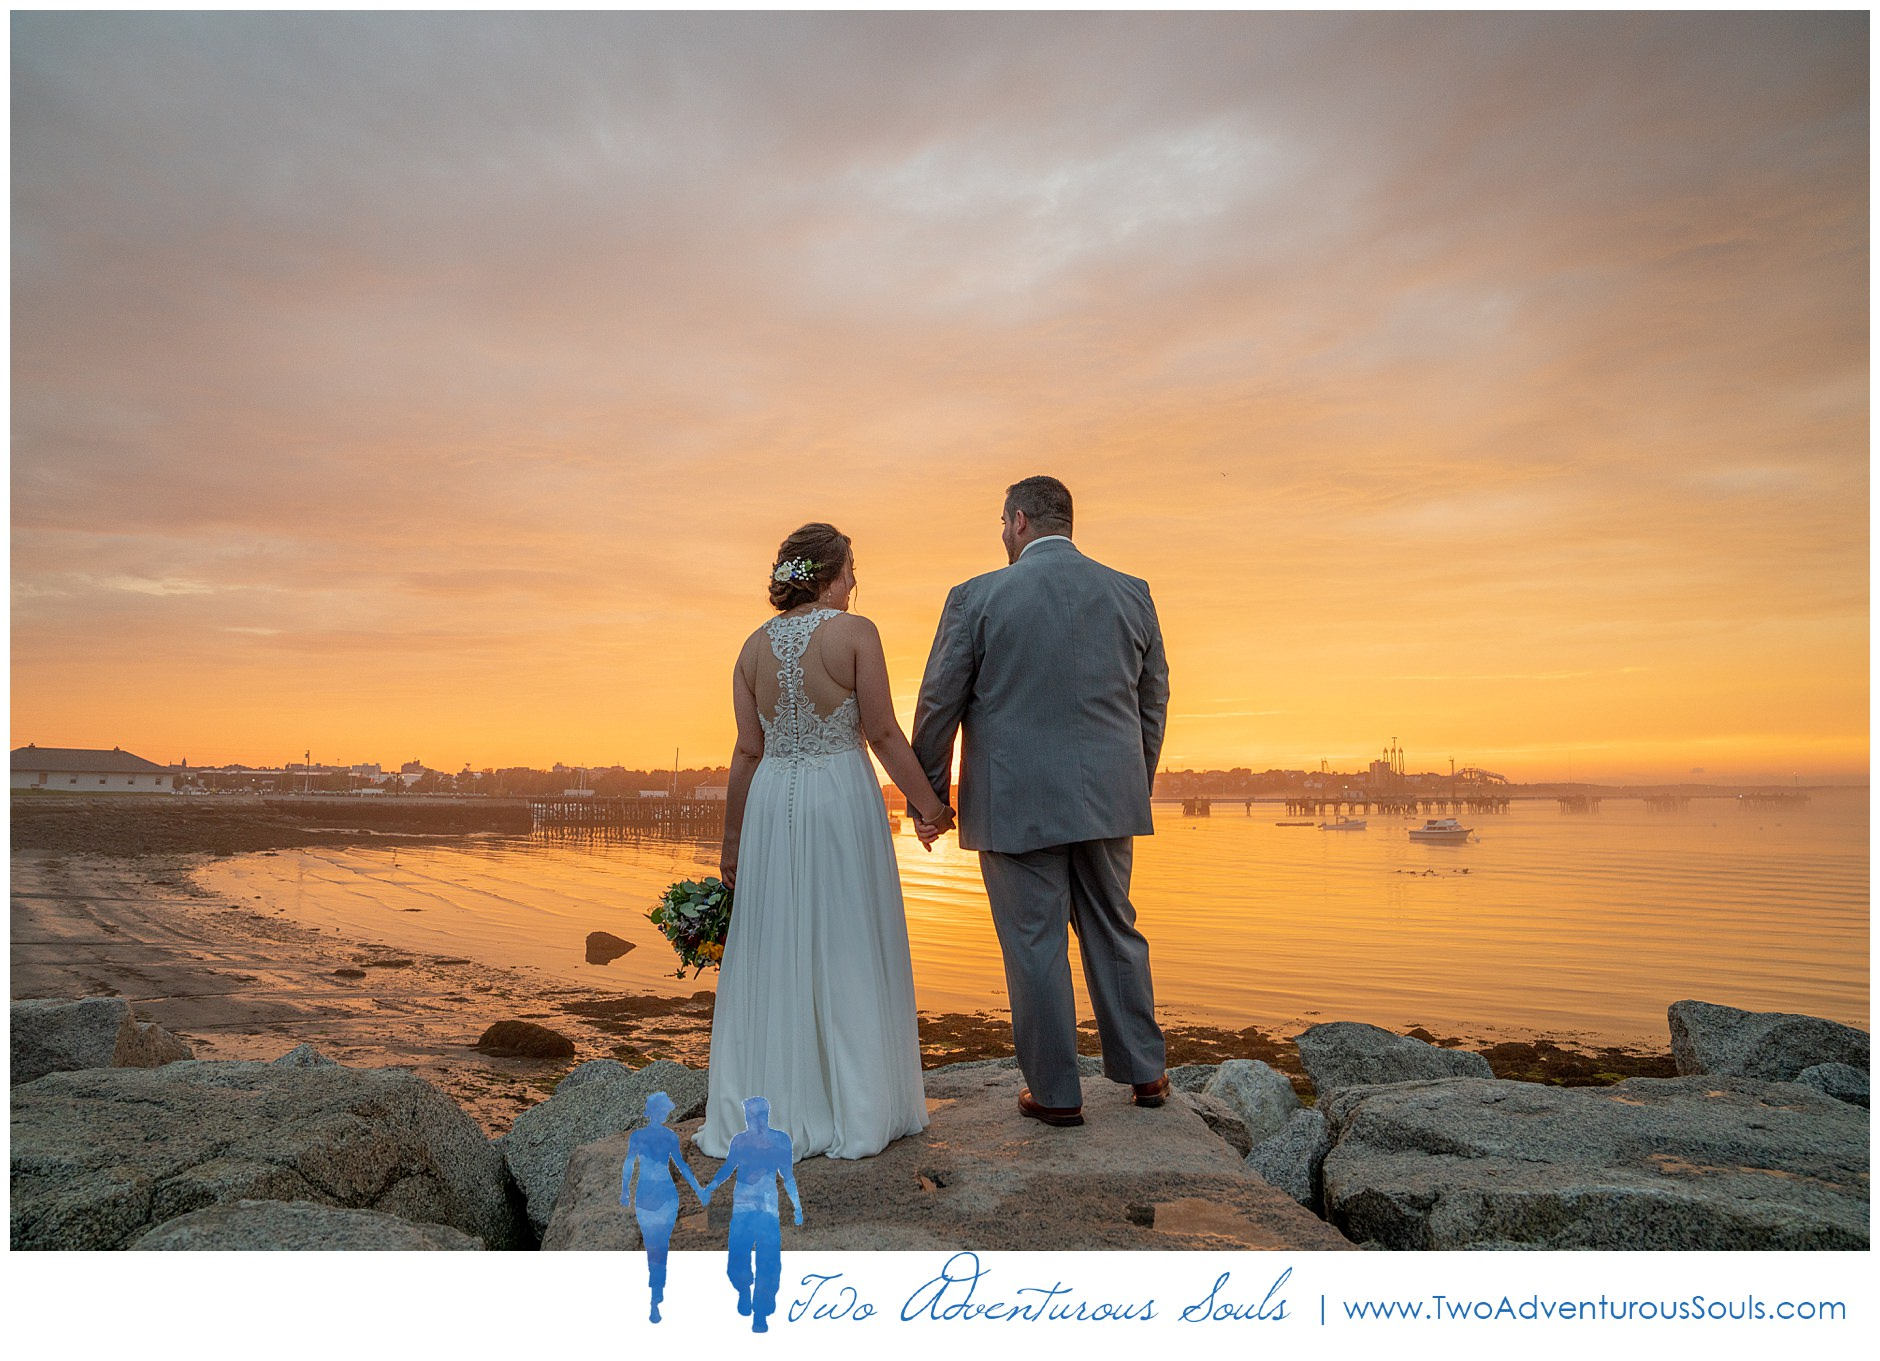 Maine Wedding Photographers, SMCC Wedding Photographers, Southern Maine Community College Wedding Photographers, Two Adventurous Souls-AshleyAaron_0041.jpg